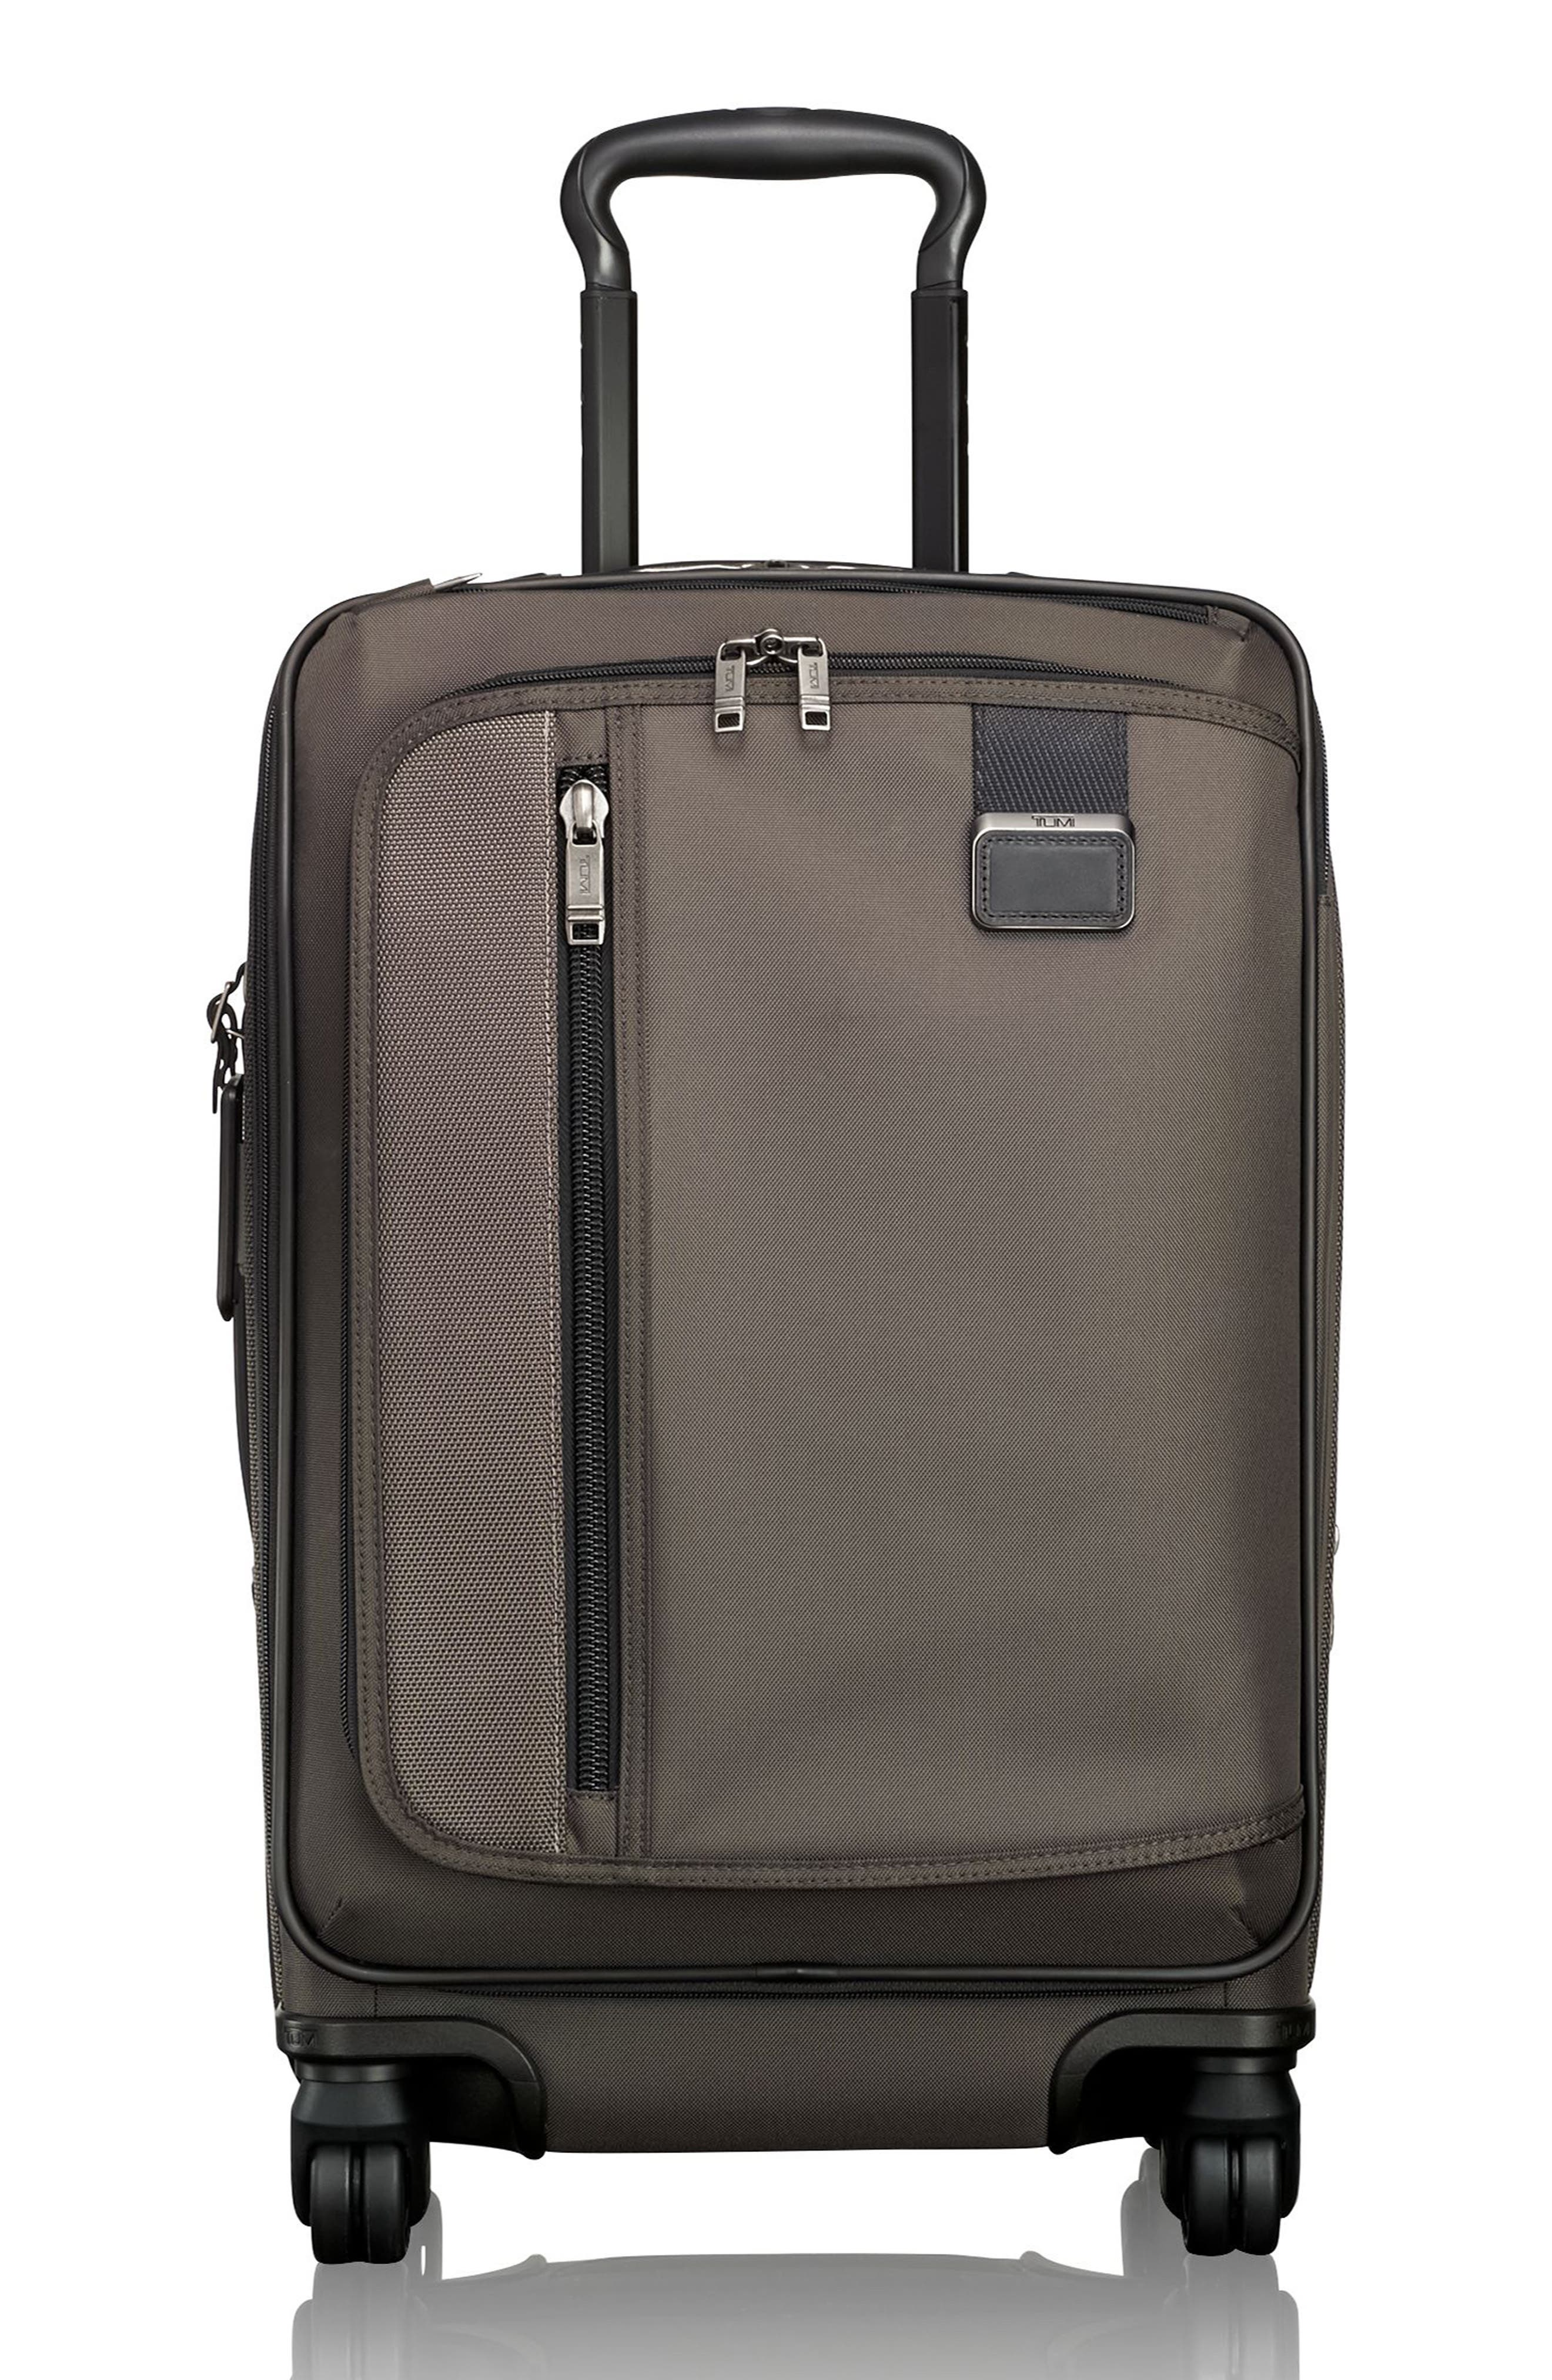 Tumi Merge - International Expandable Rolling Carry-On